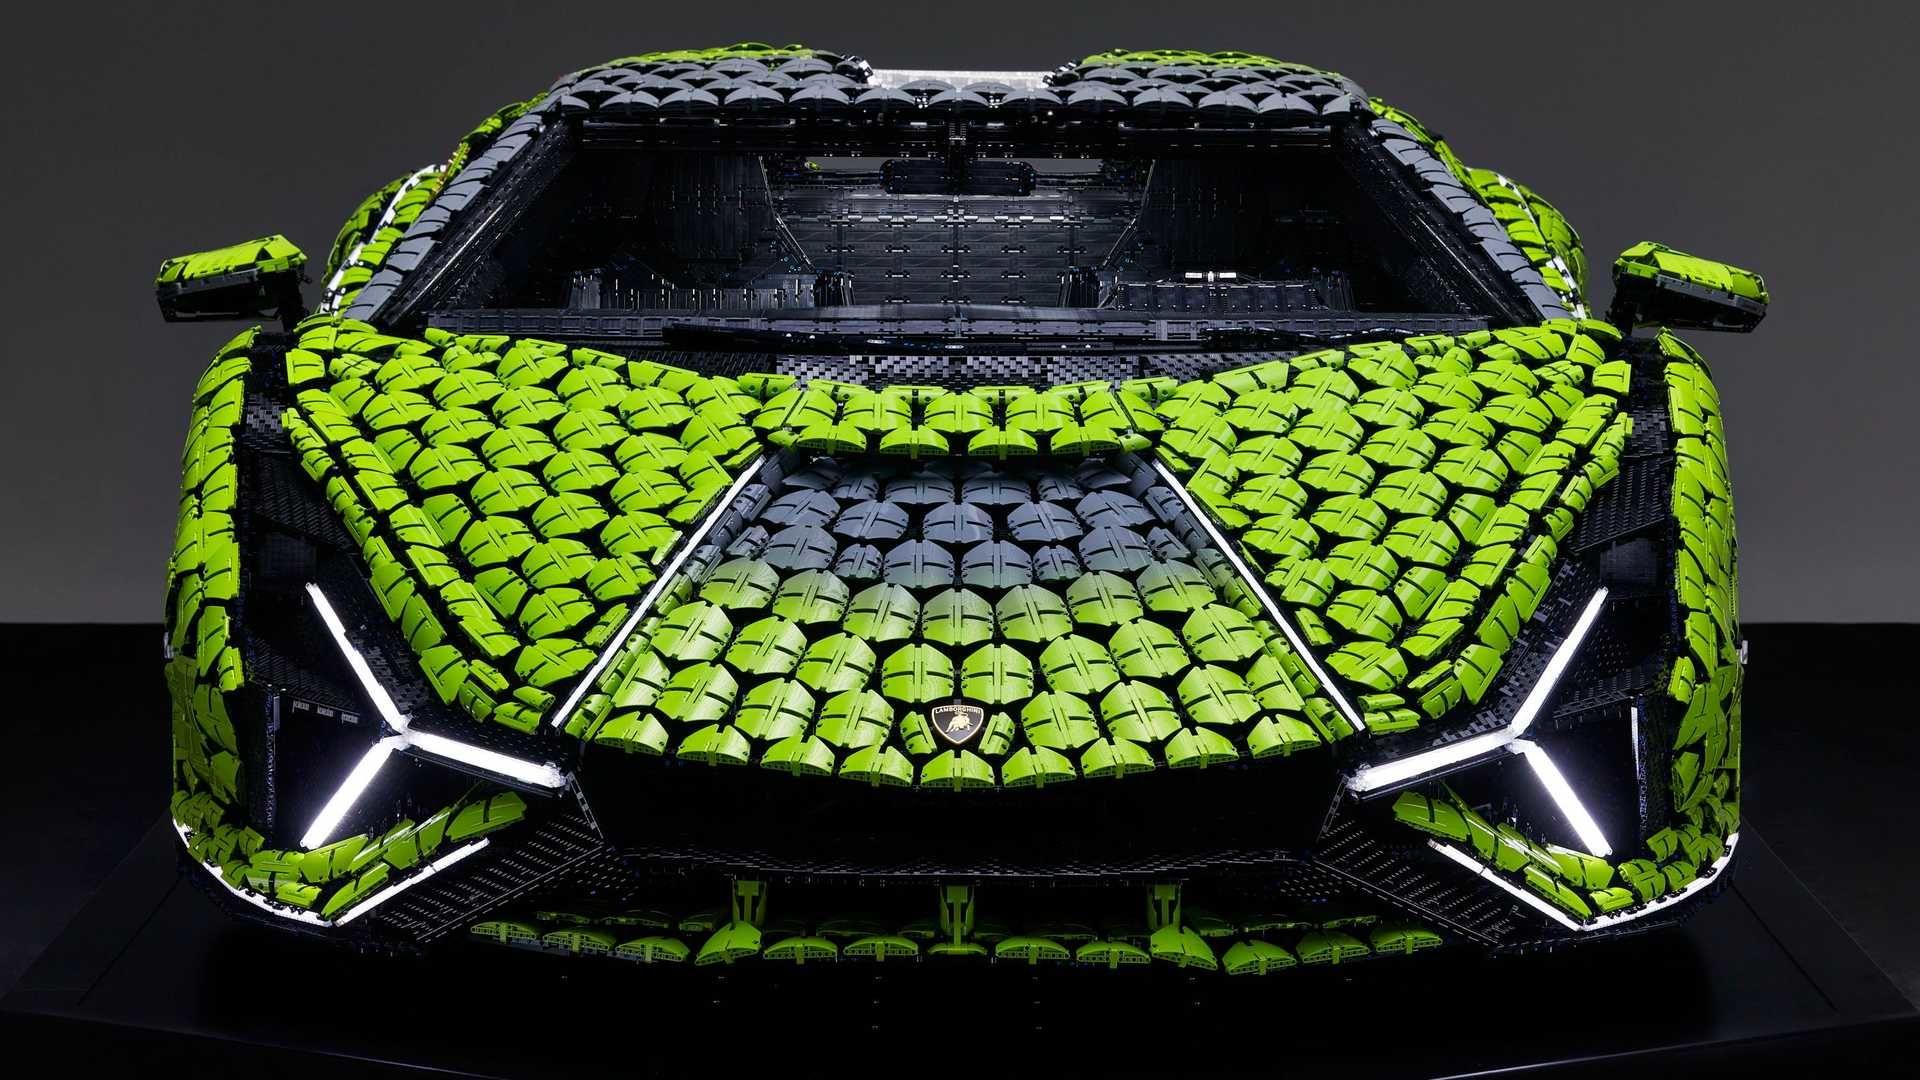 Lego 打造出夢幻的「Lamborghini Sián FKP 37」1:1 模型